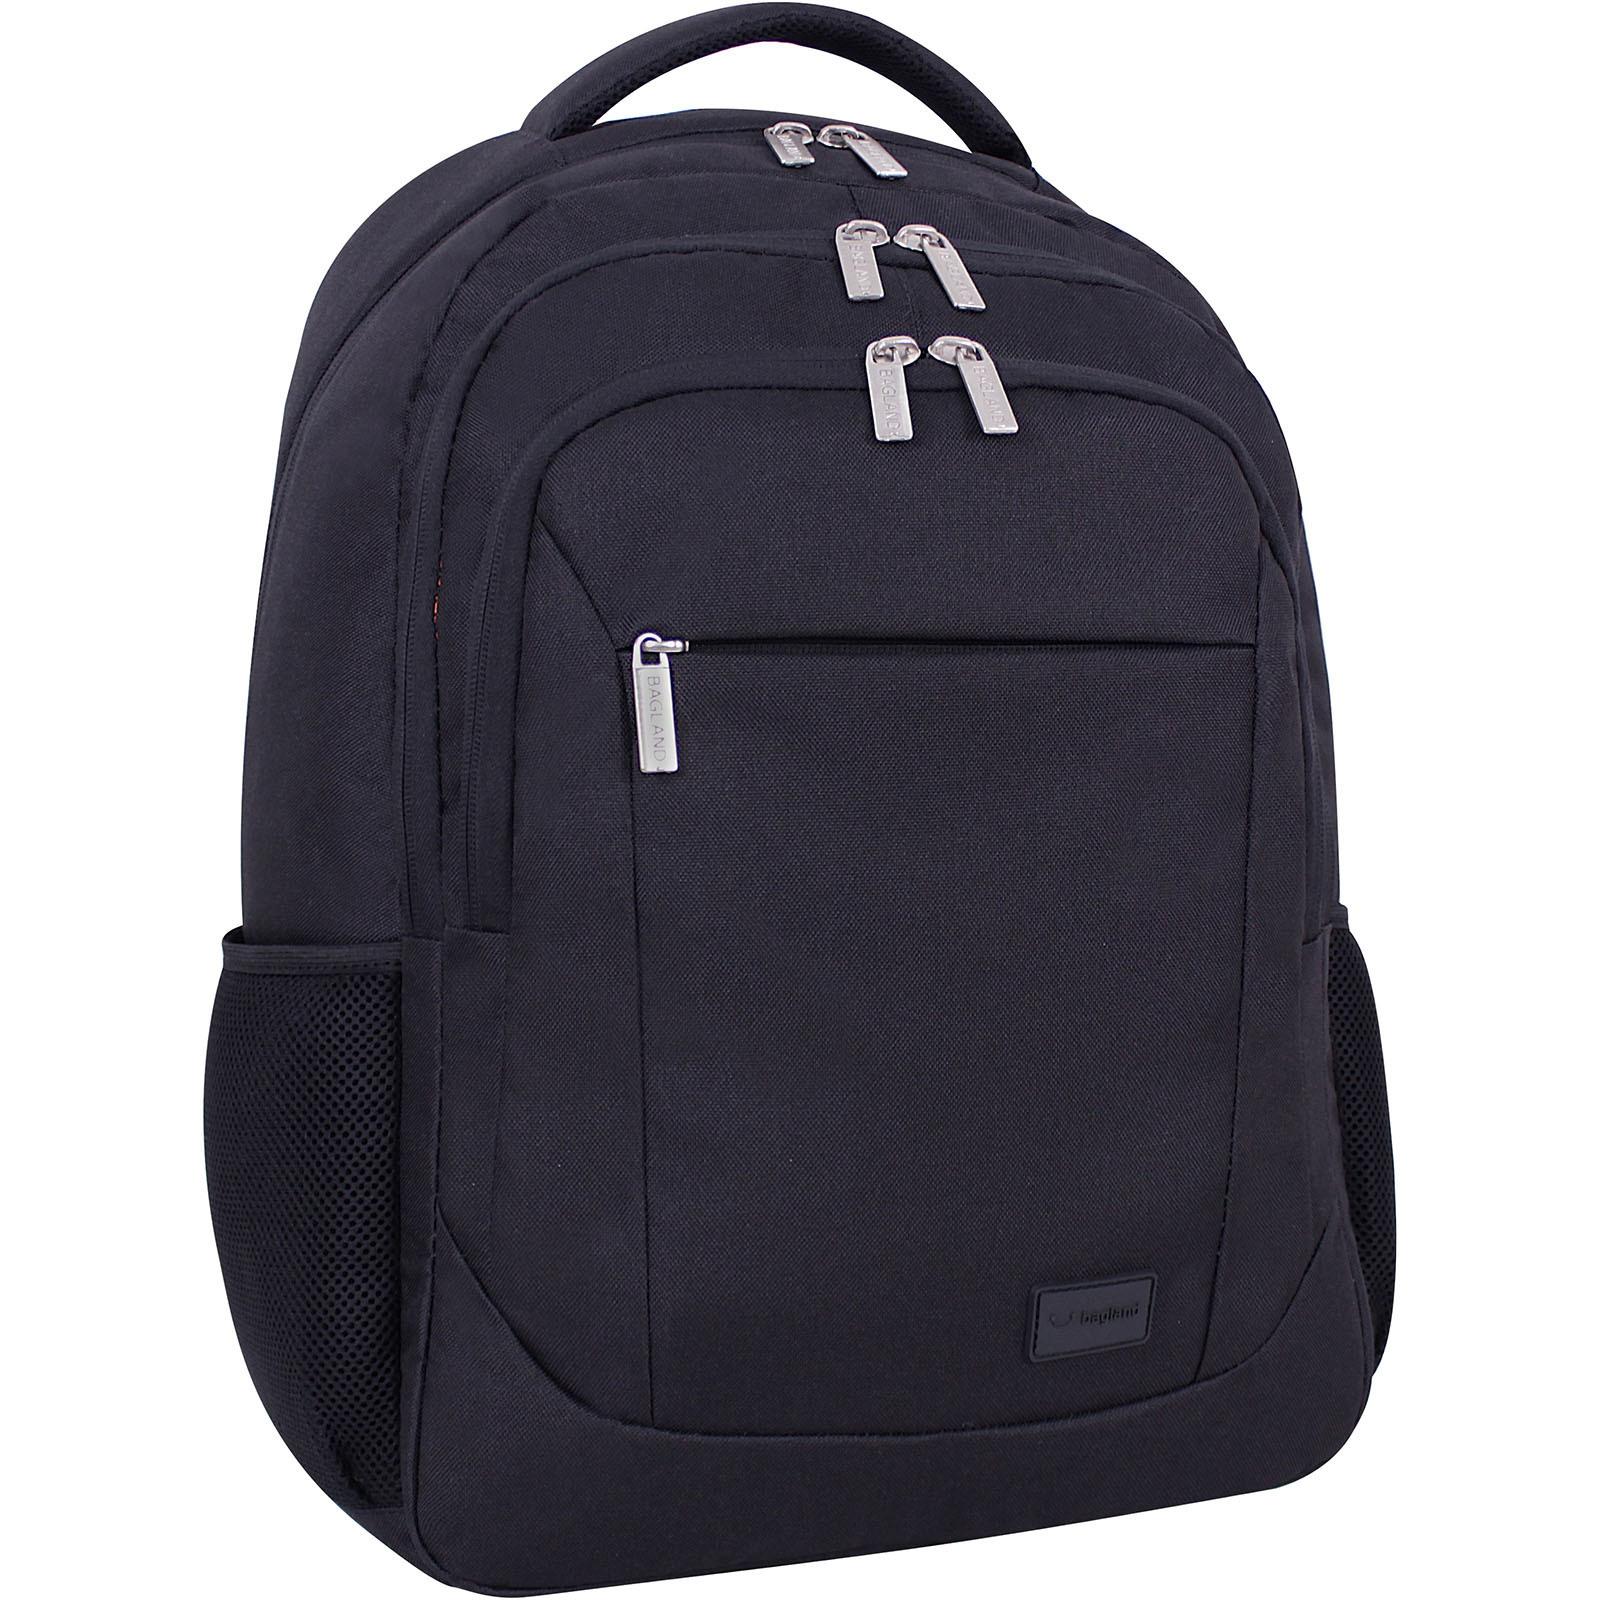 Мужские рюкзаки Рюкзак Bagland Hector 32 л. Чёрный (0012666) IMG_9950.JPG